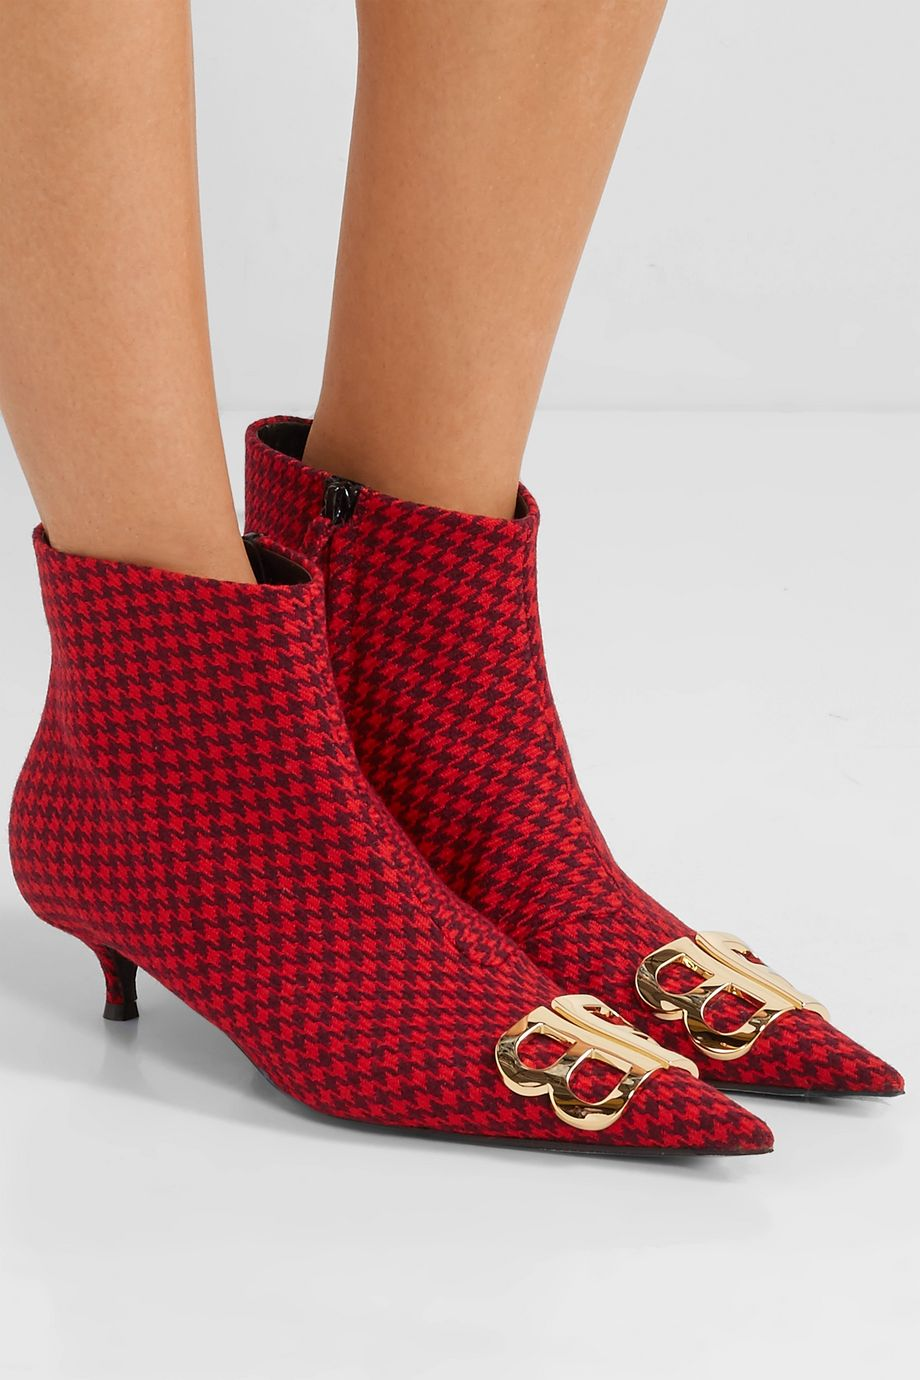 Balenciaga Knife logo-embellished houndstooth wool ankle boots